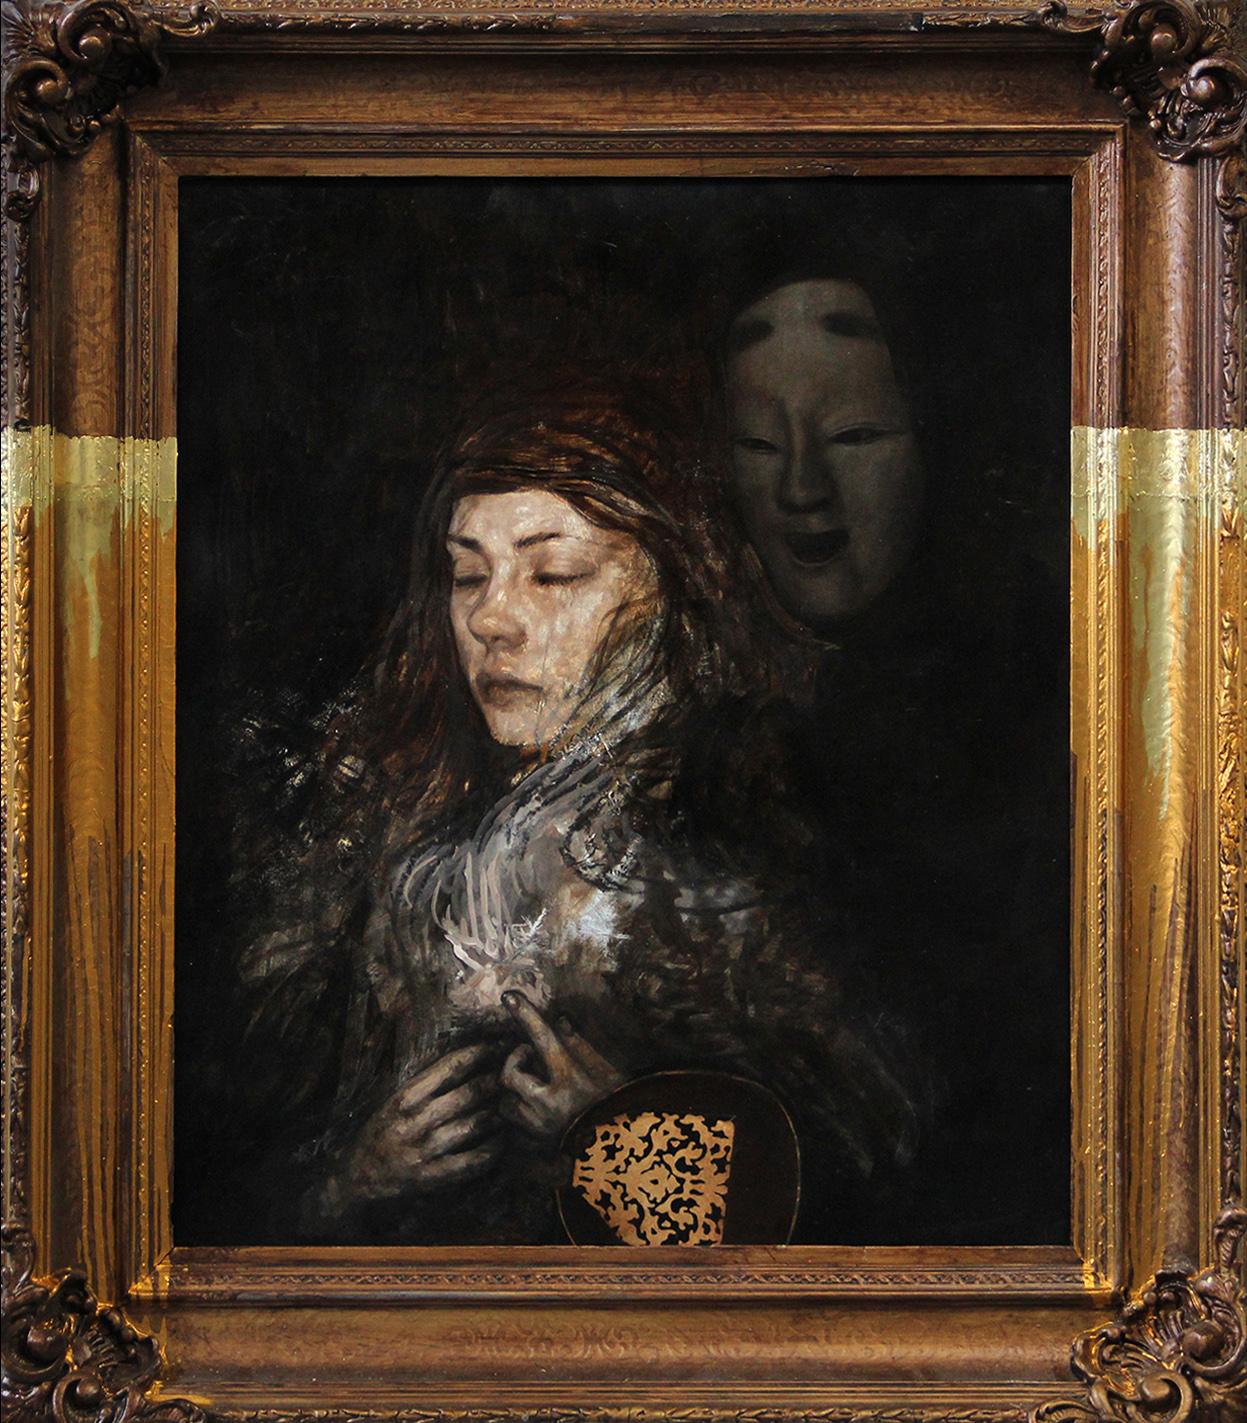 Rumination-Karolczak.jpg